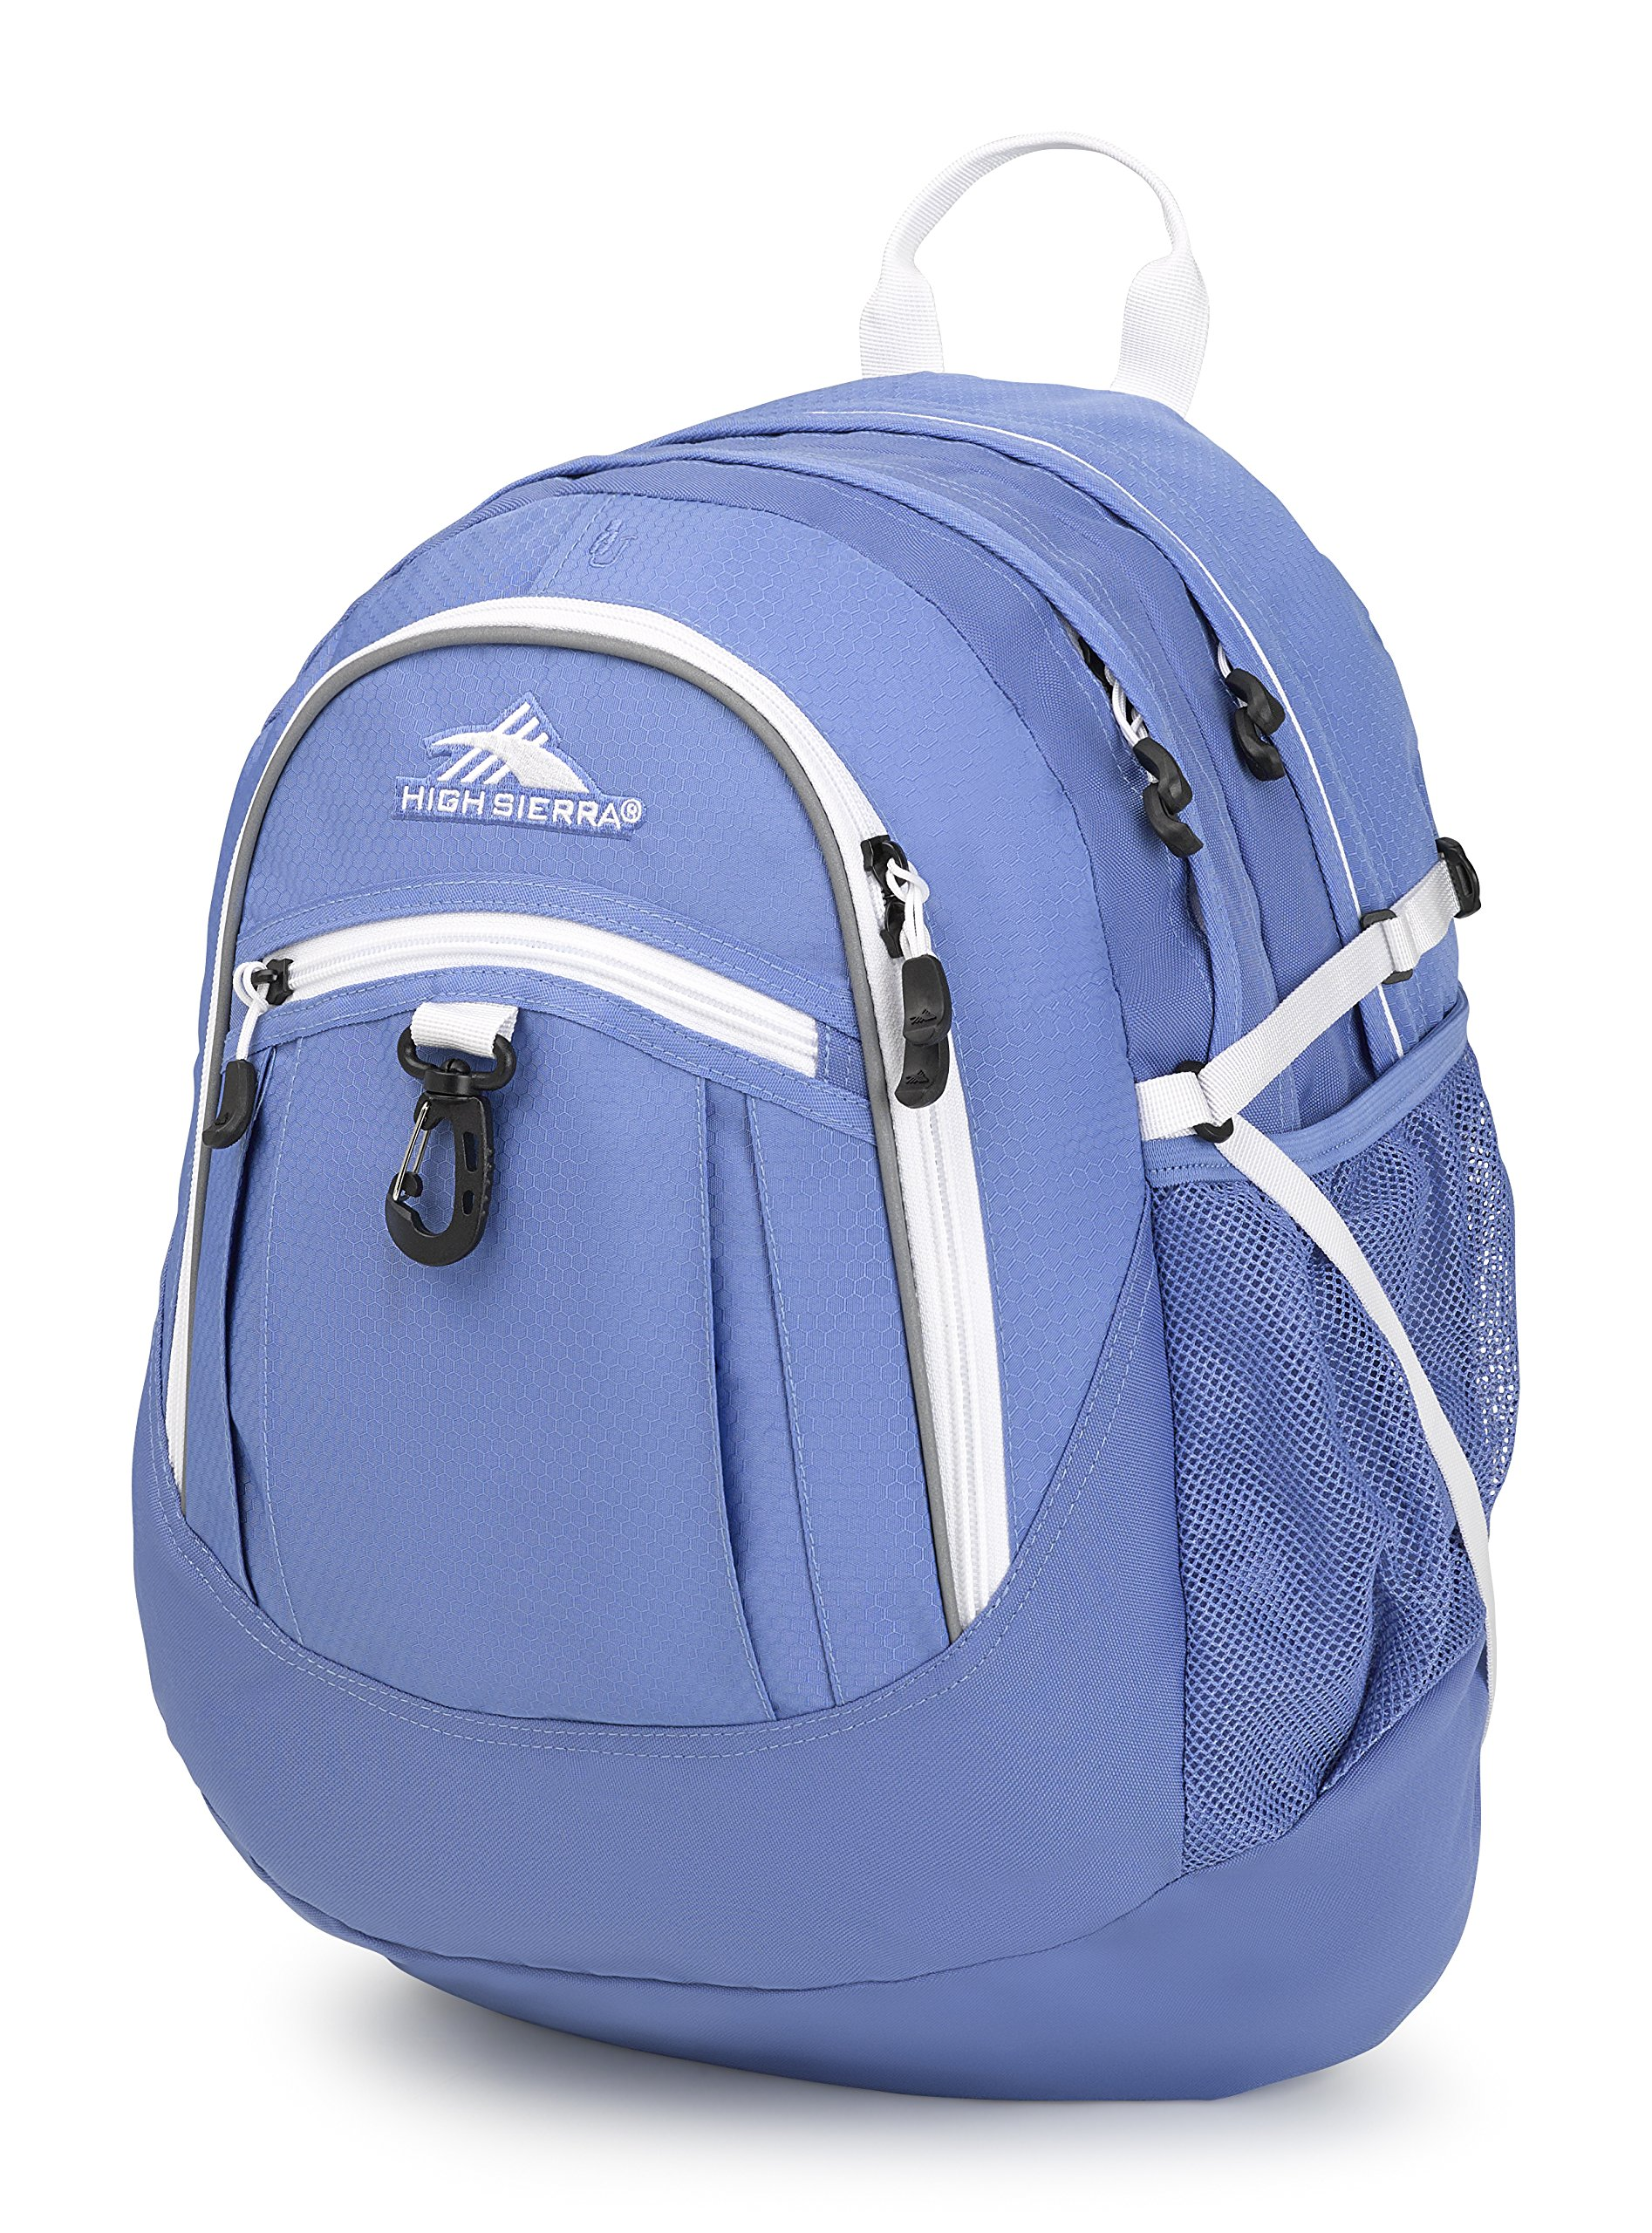 High Sierra Fatboy Backpack, Lapis/White